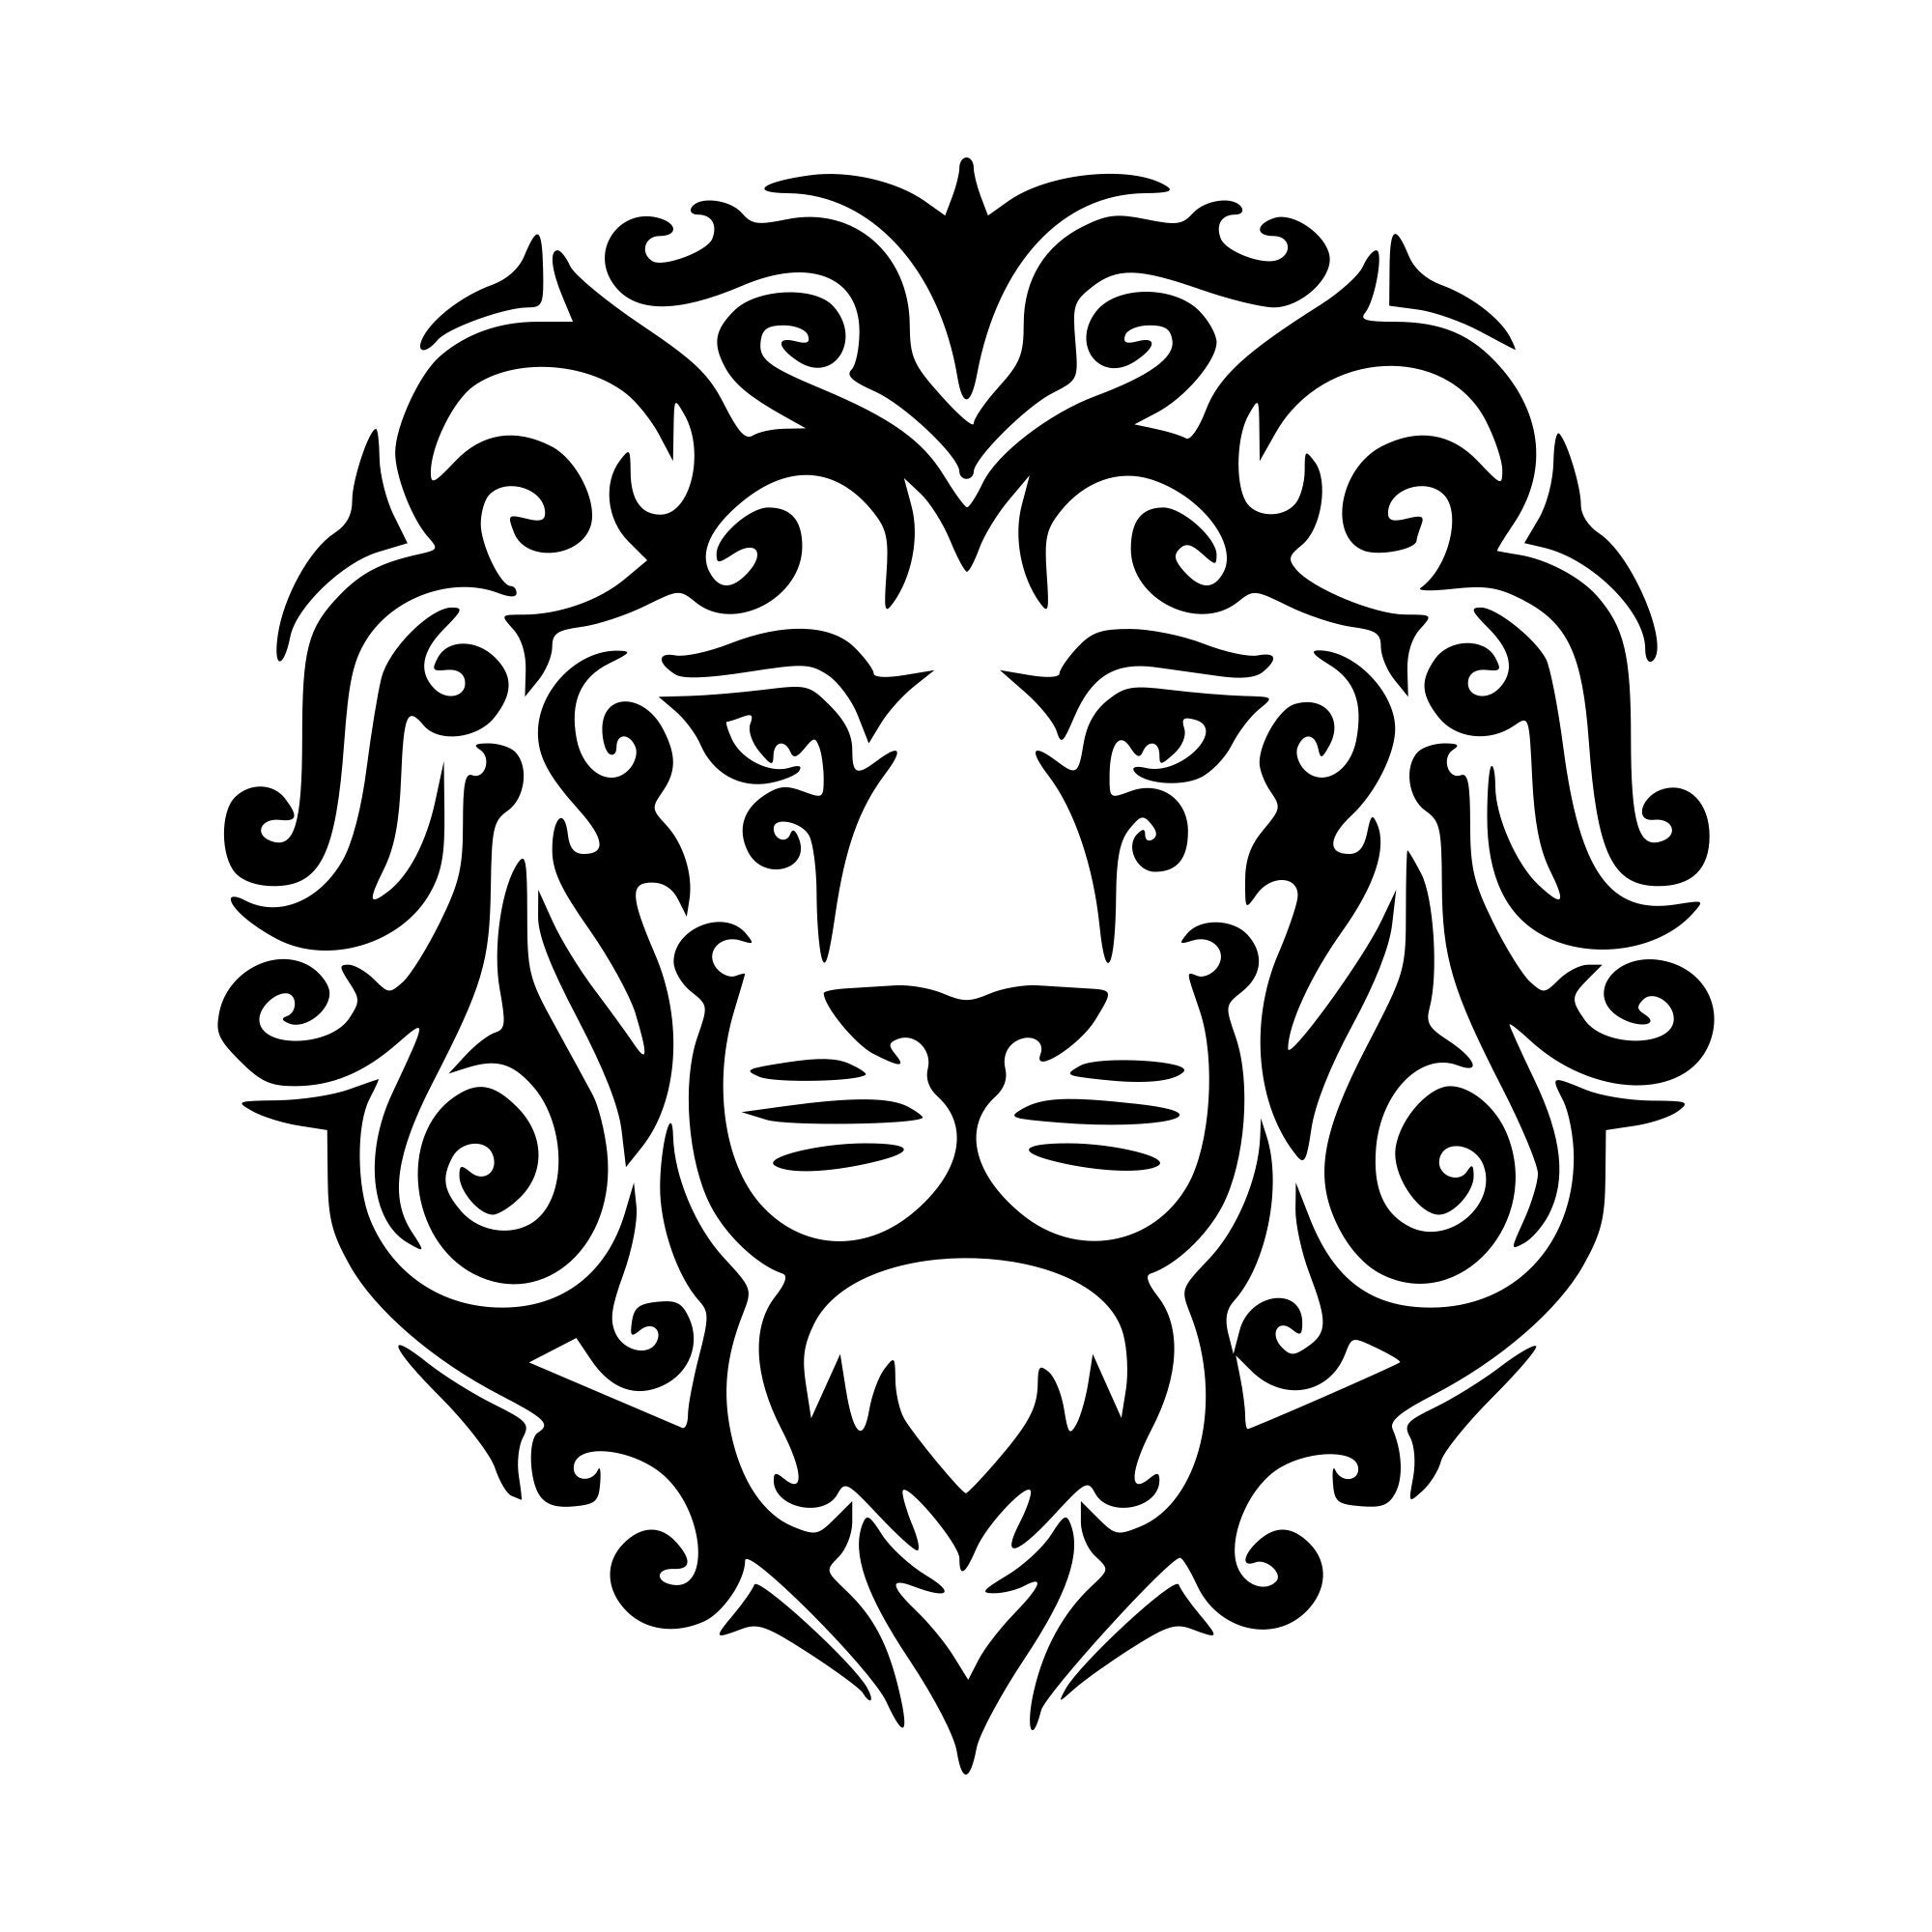 Download Lion Face Svg Free - Lion Head Stock Vector Art & More ...